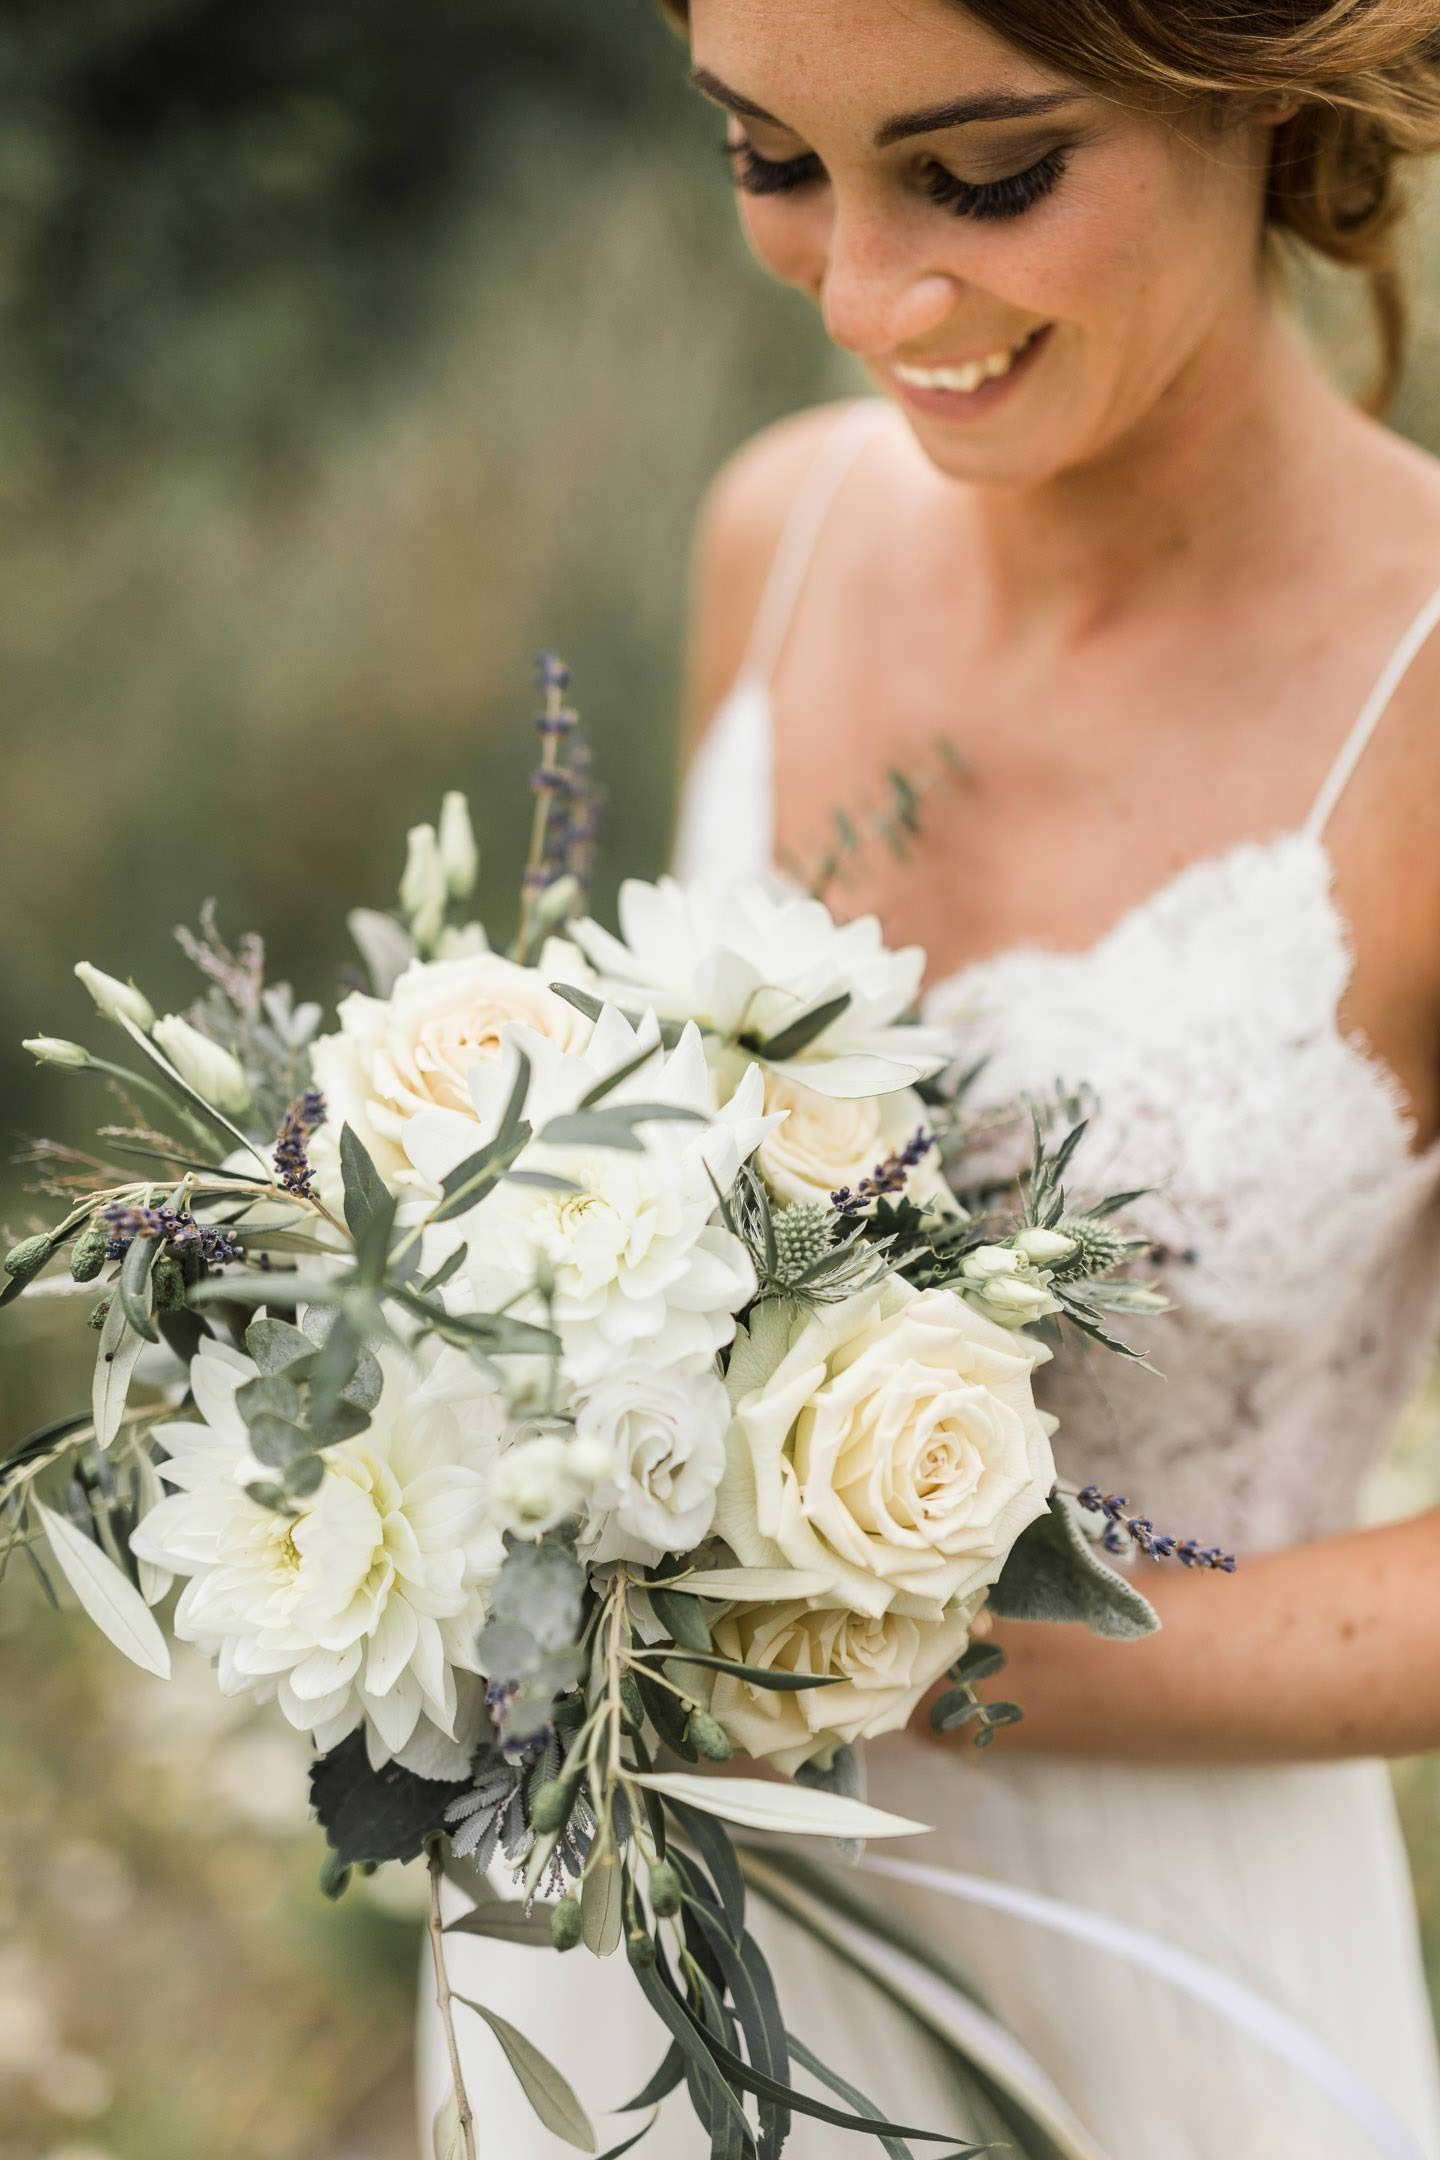 Rebecca & Andreas: Boho-Hochzeit unter freiem Himmel - Hochzeitswahn - Sei inspiriert #fallbridalbouquets